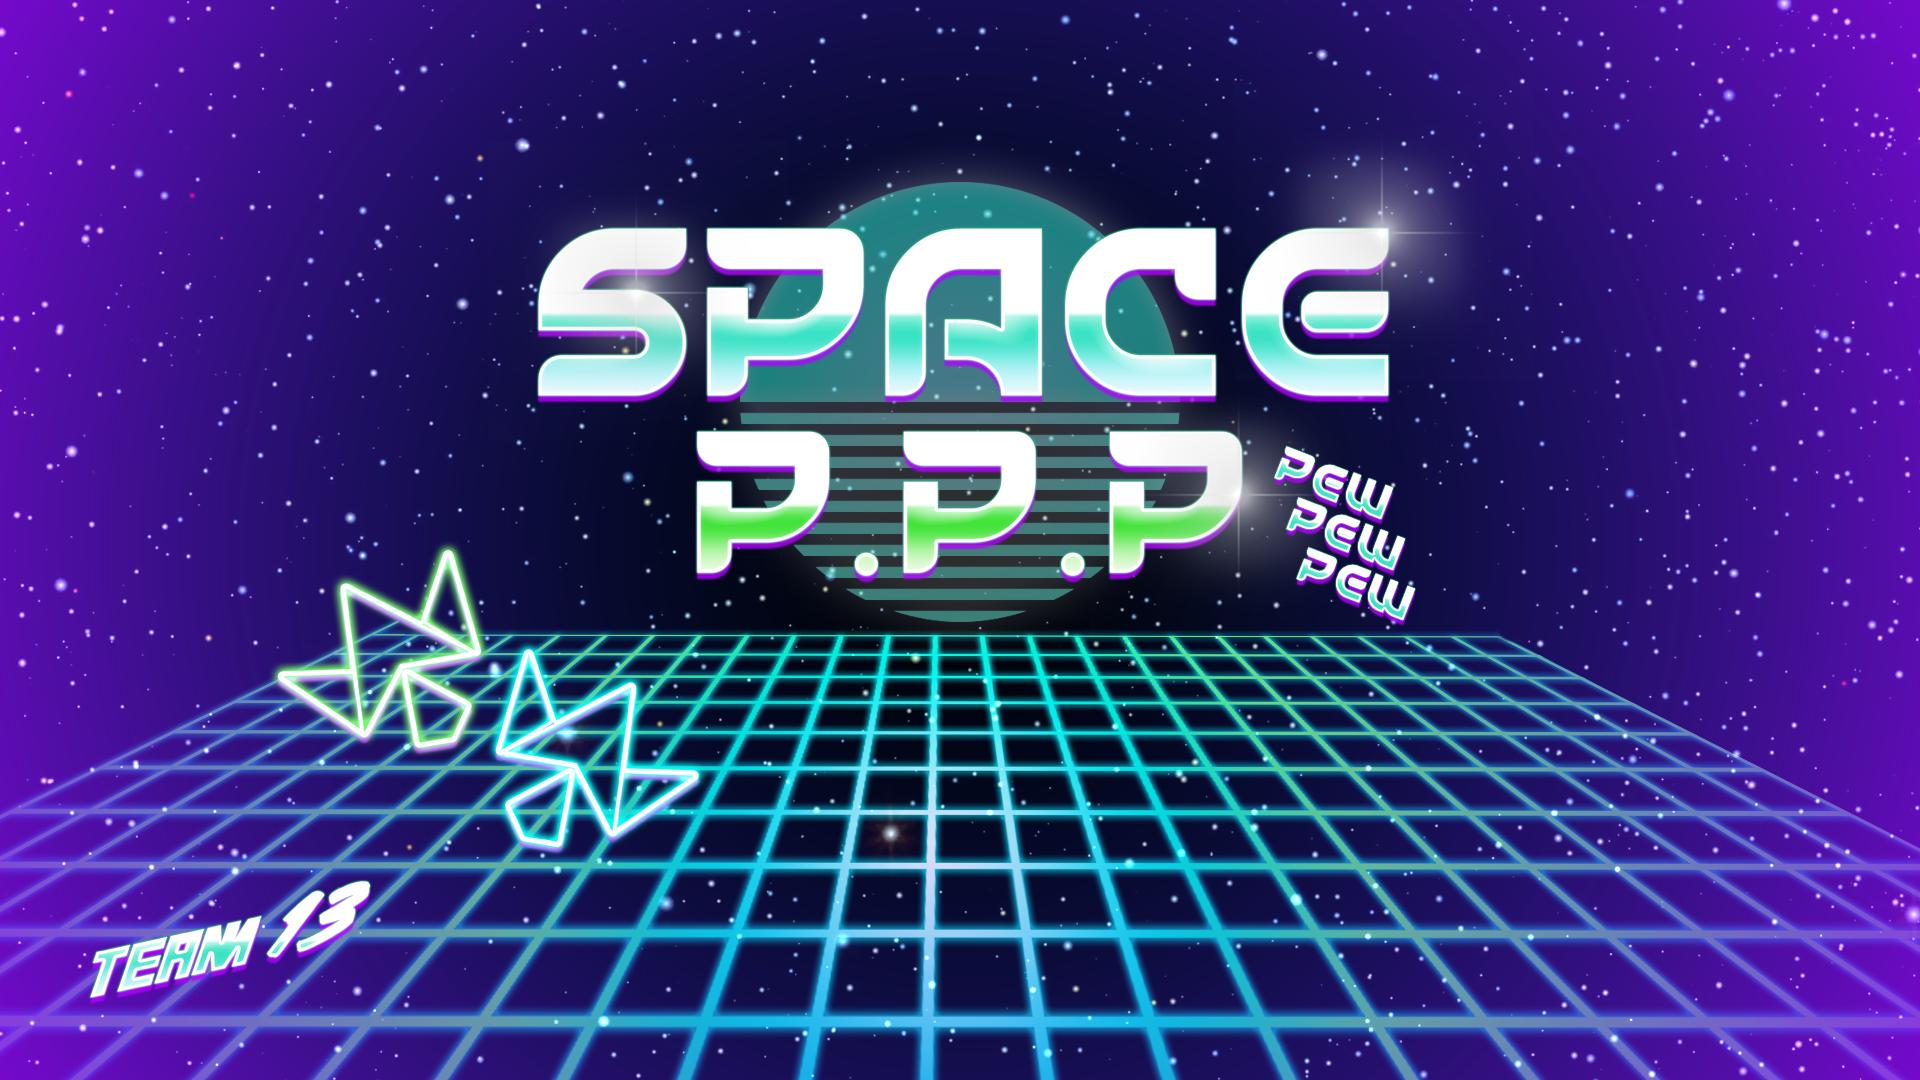 Space Pew Pew Pew (PPP)